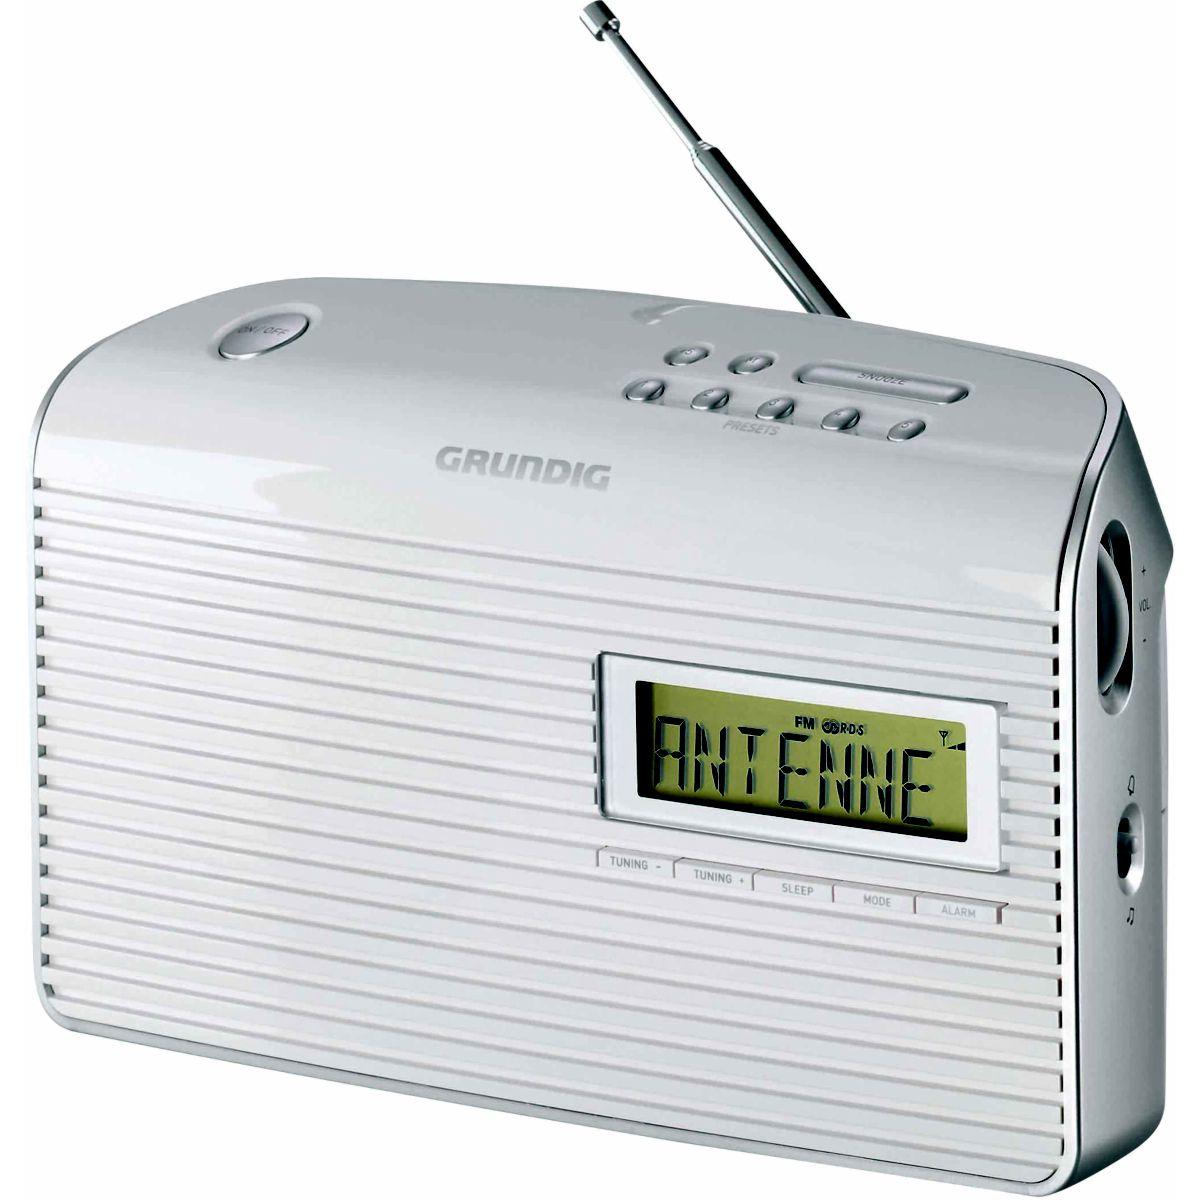 Radio analogique grundig music 61 blanc - livraison offerte : code premium